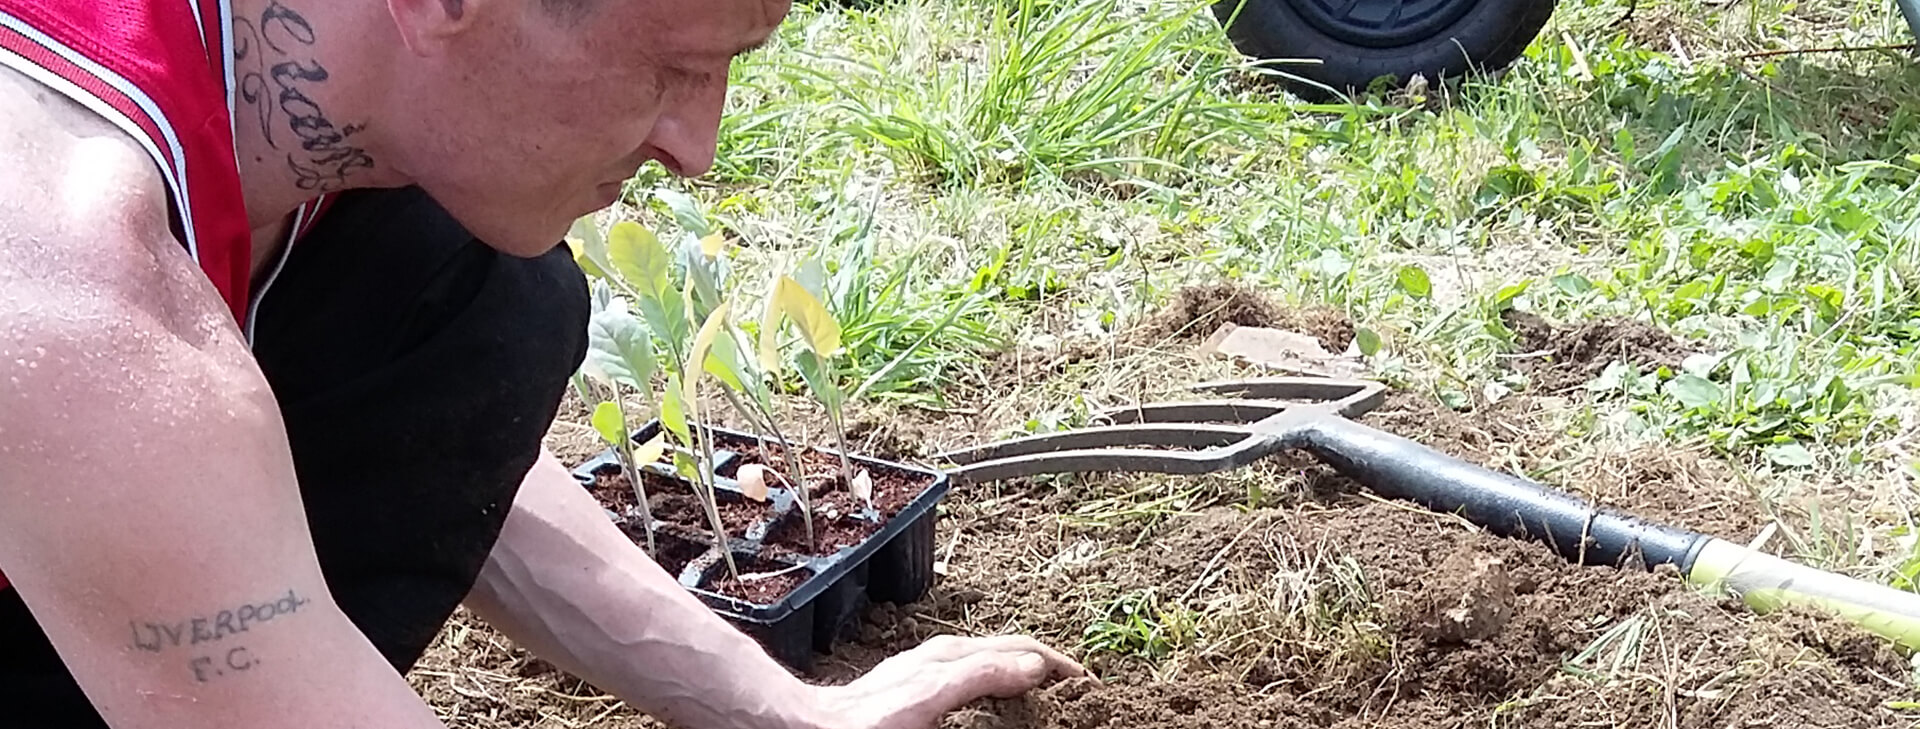 Get Into Gardening